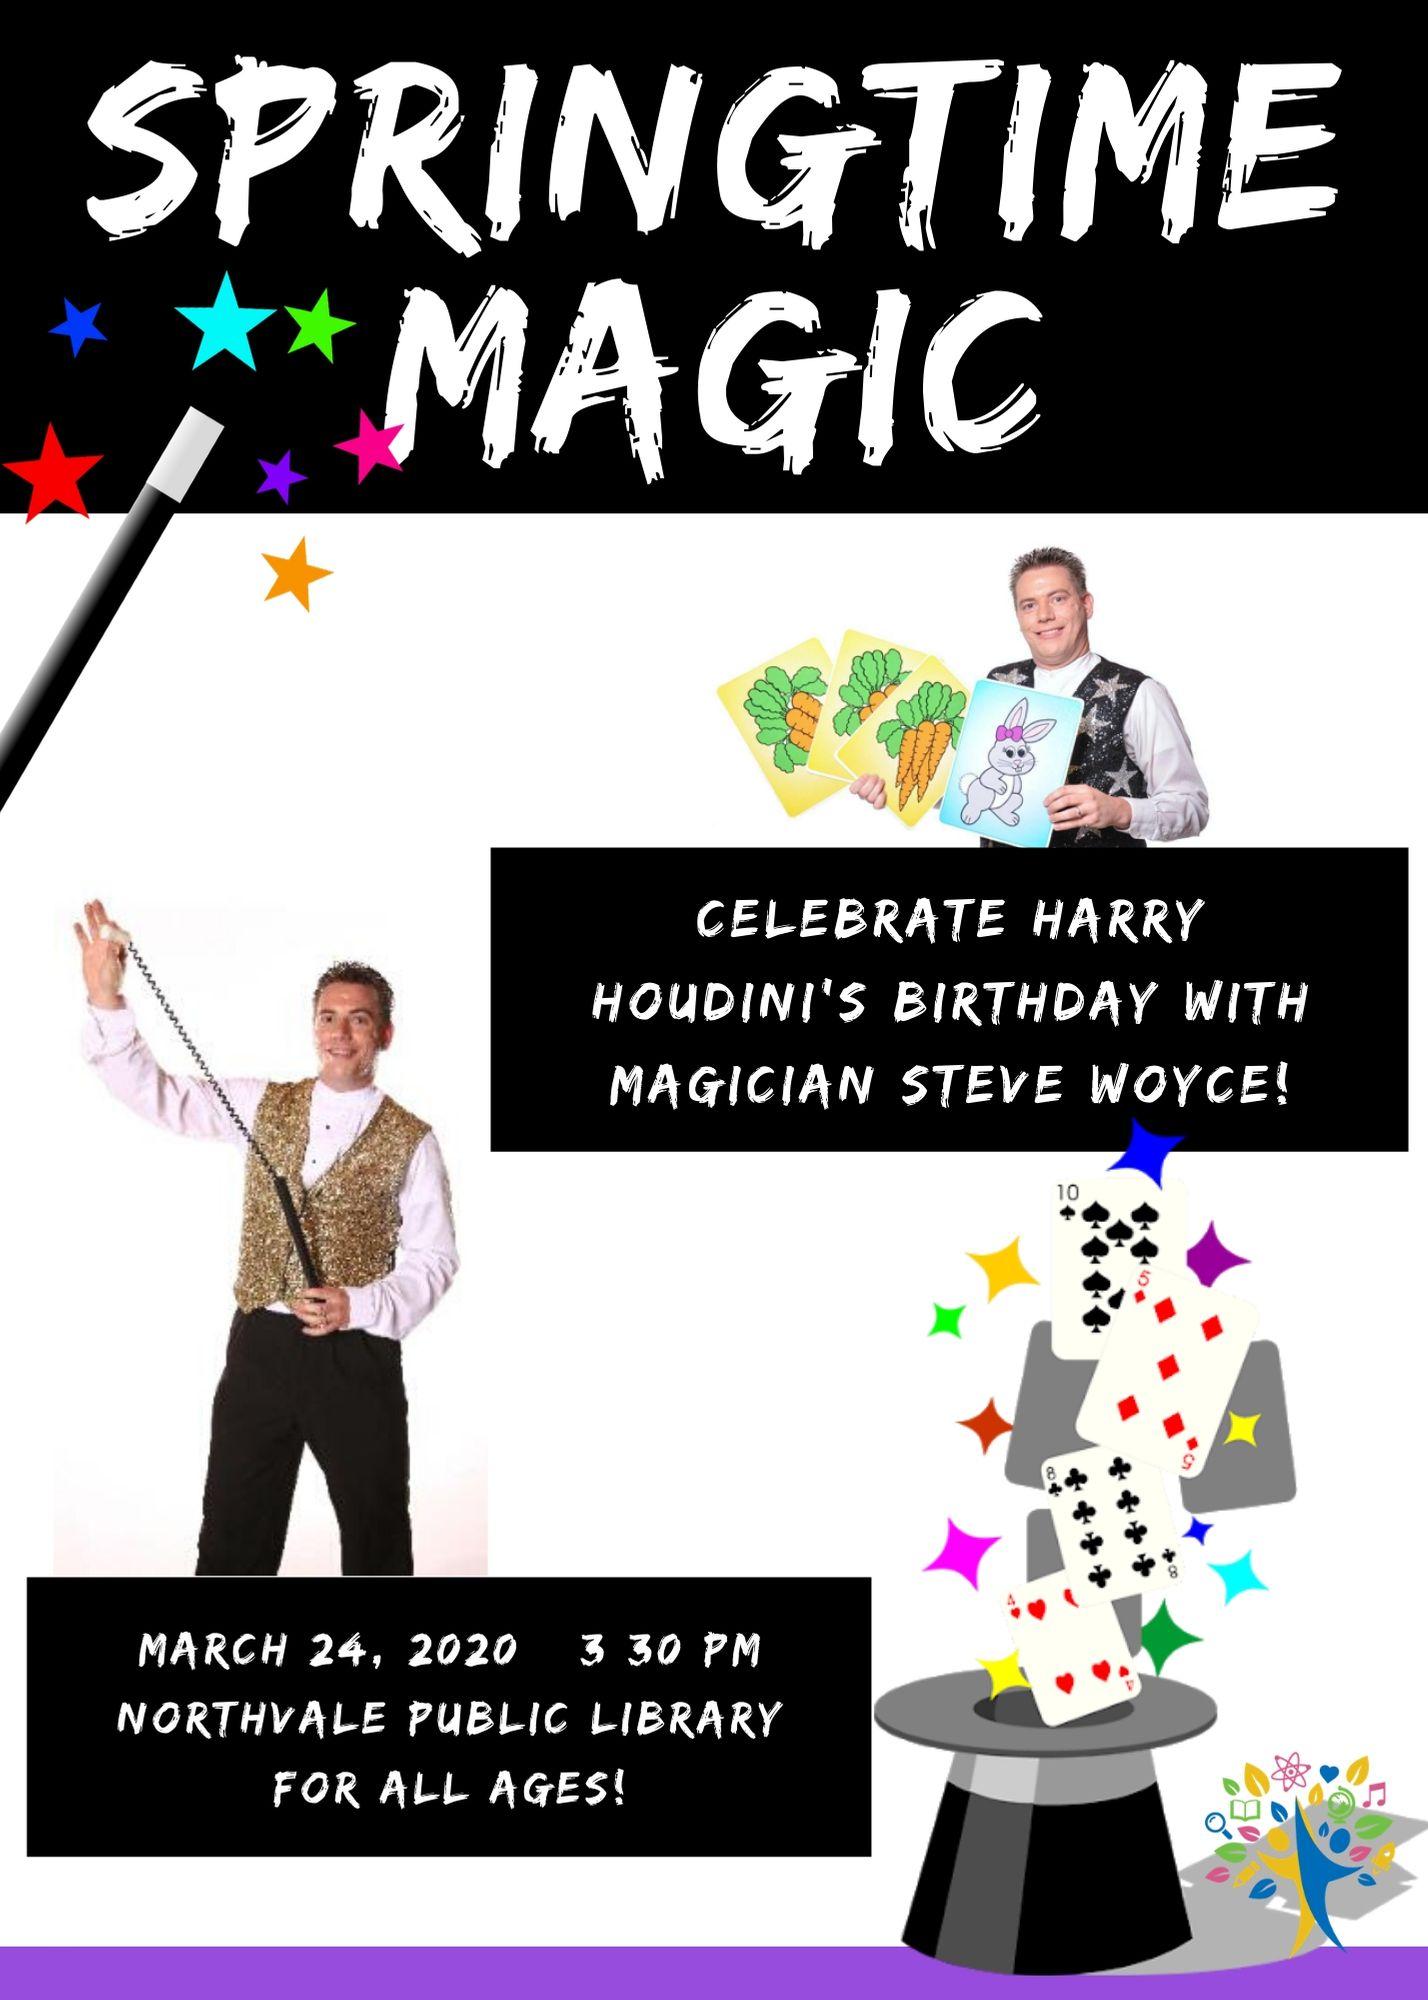 Springtime Magic with Steve Woyce